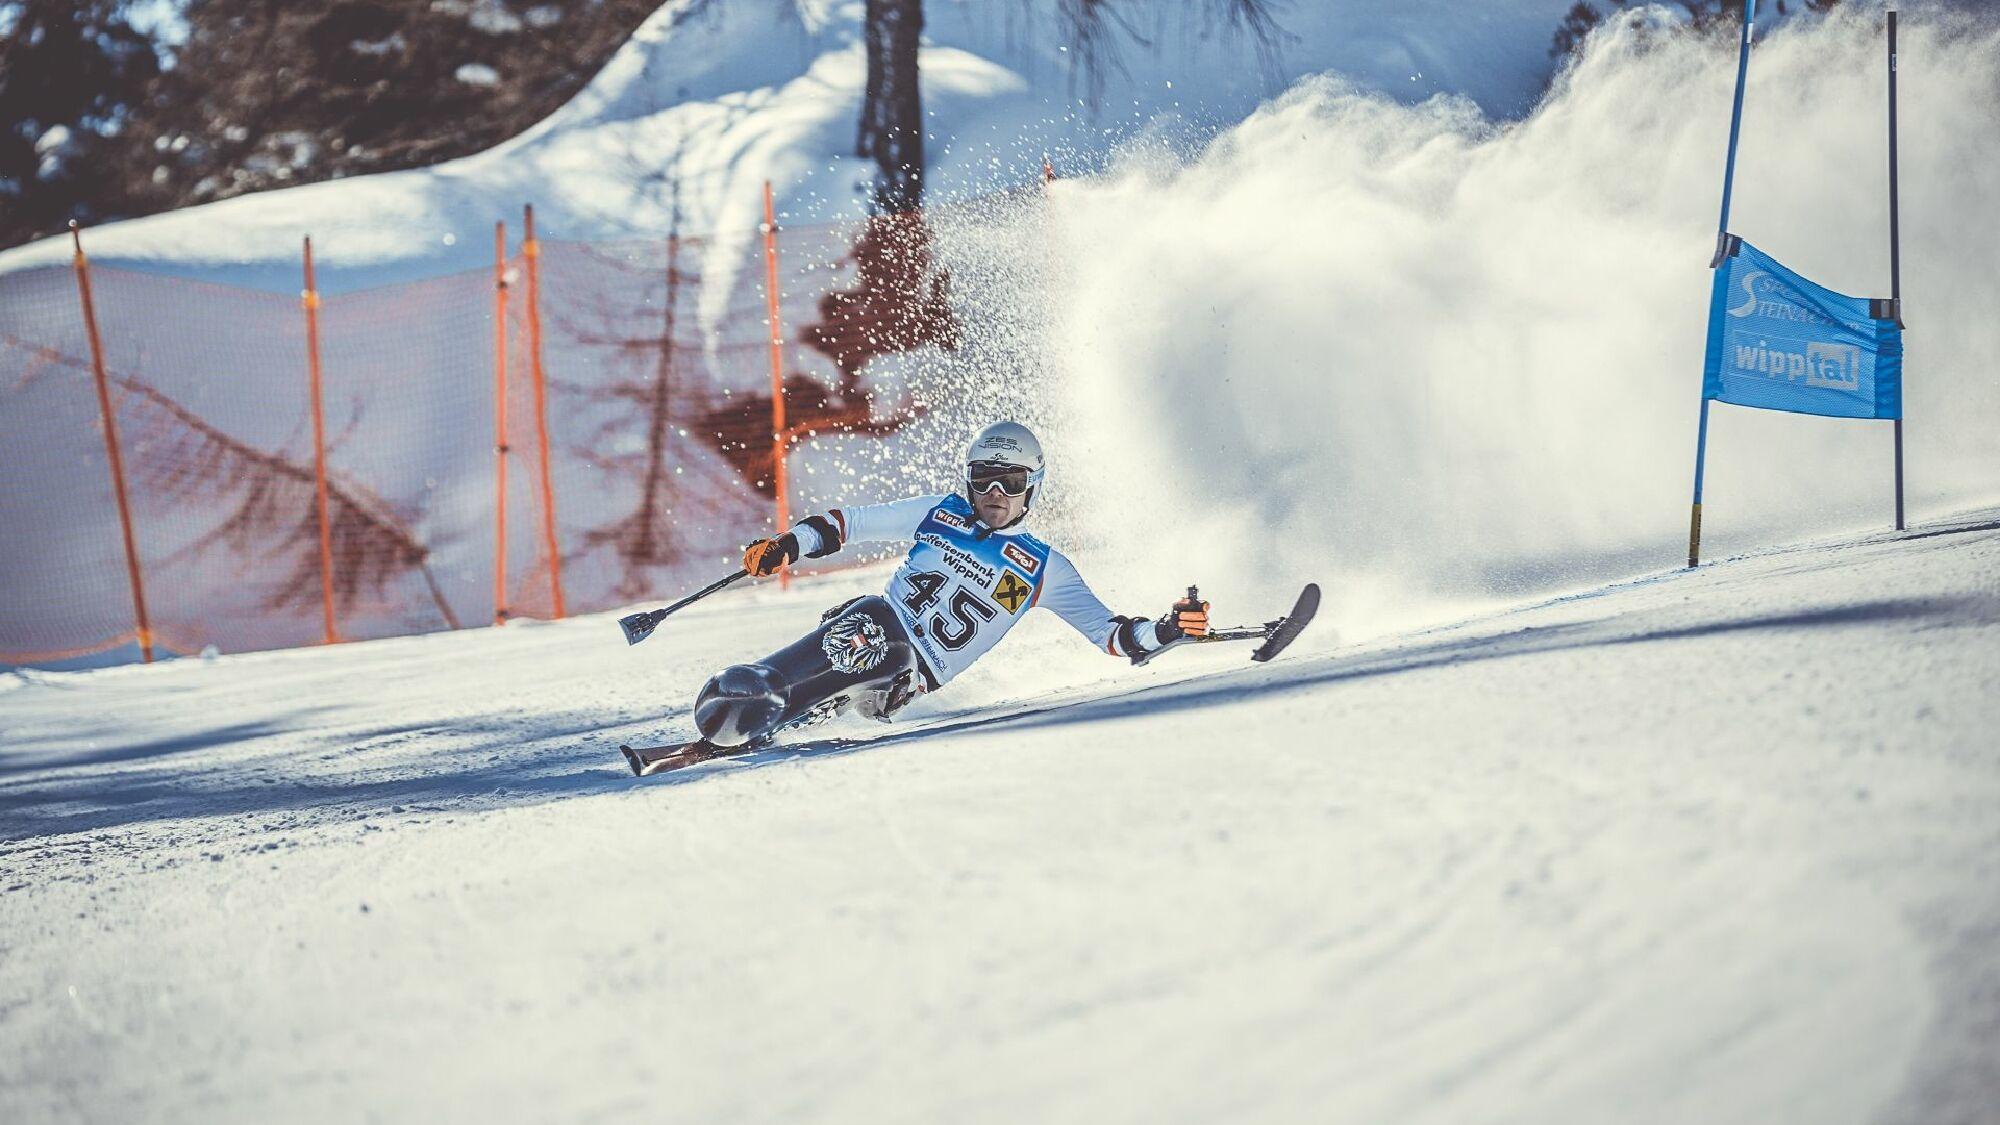 SkiWelt Hopfgarten öffnet Skibetrieb für Tagesgäste